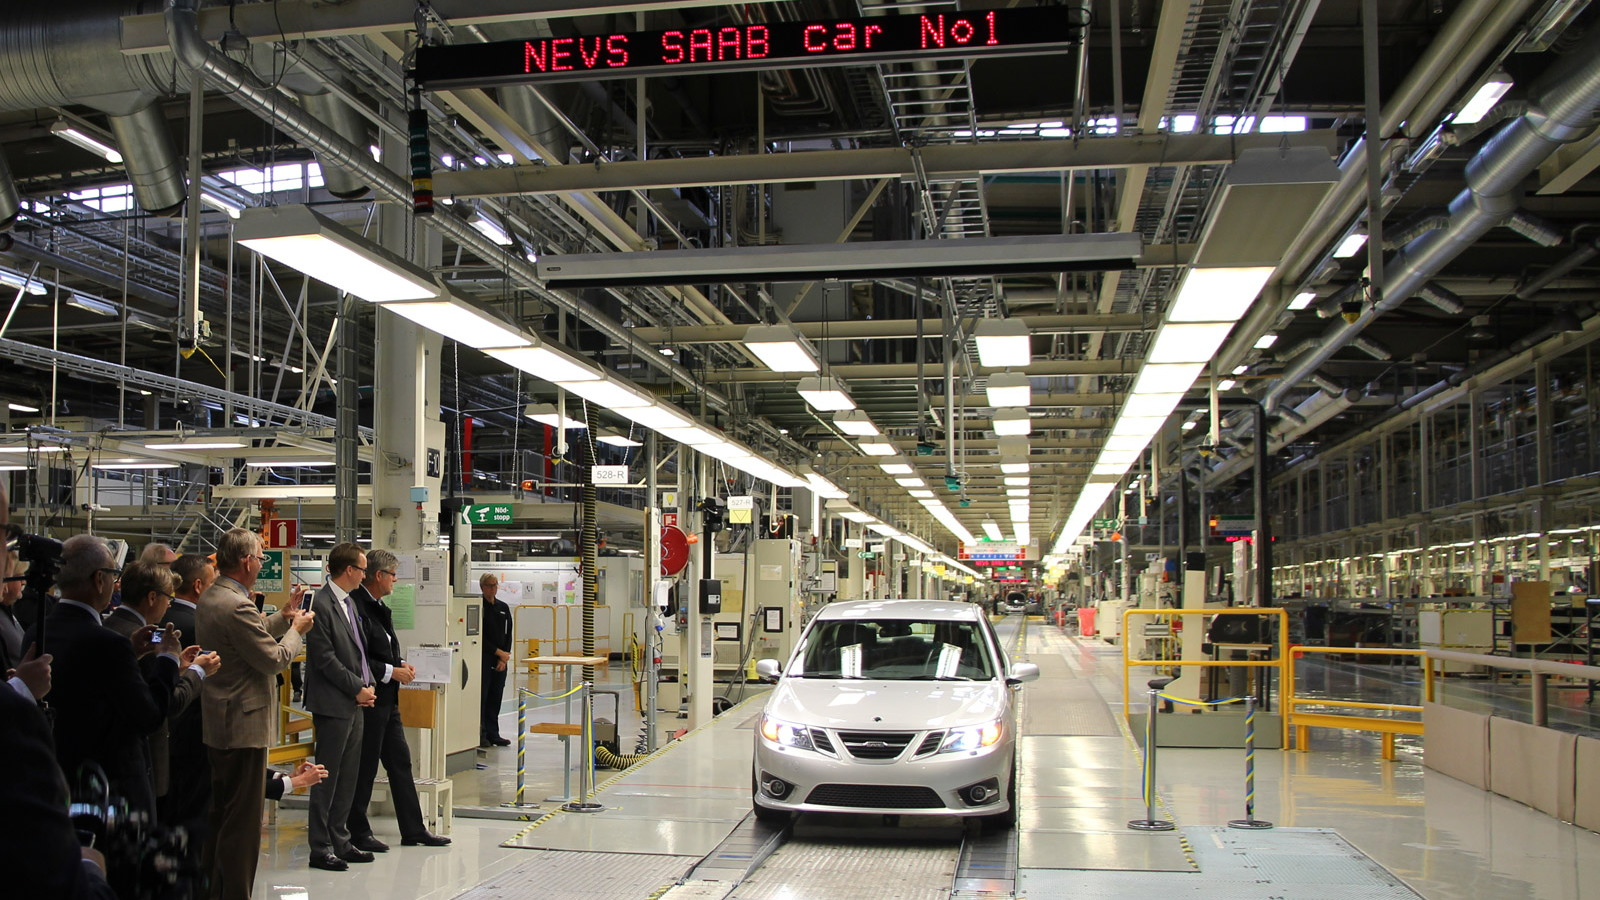 NEVS starts production of 2014 Saab 9-3